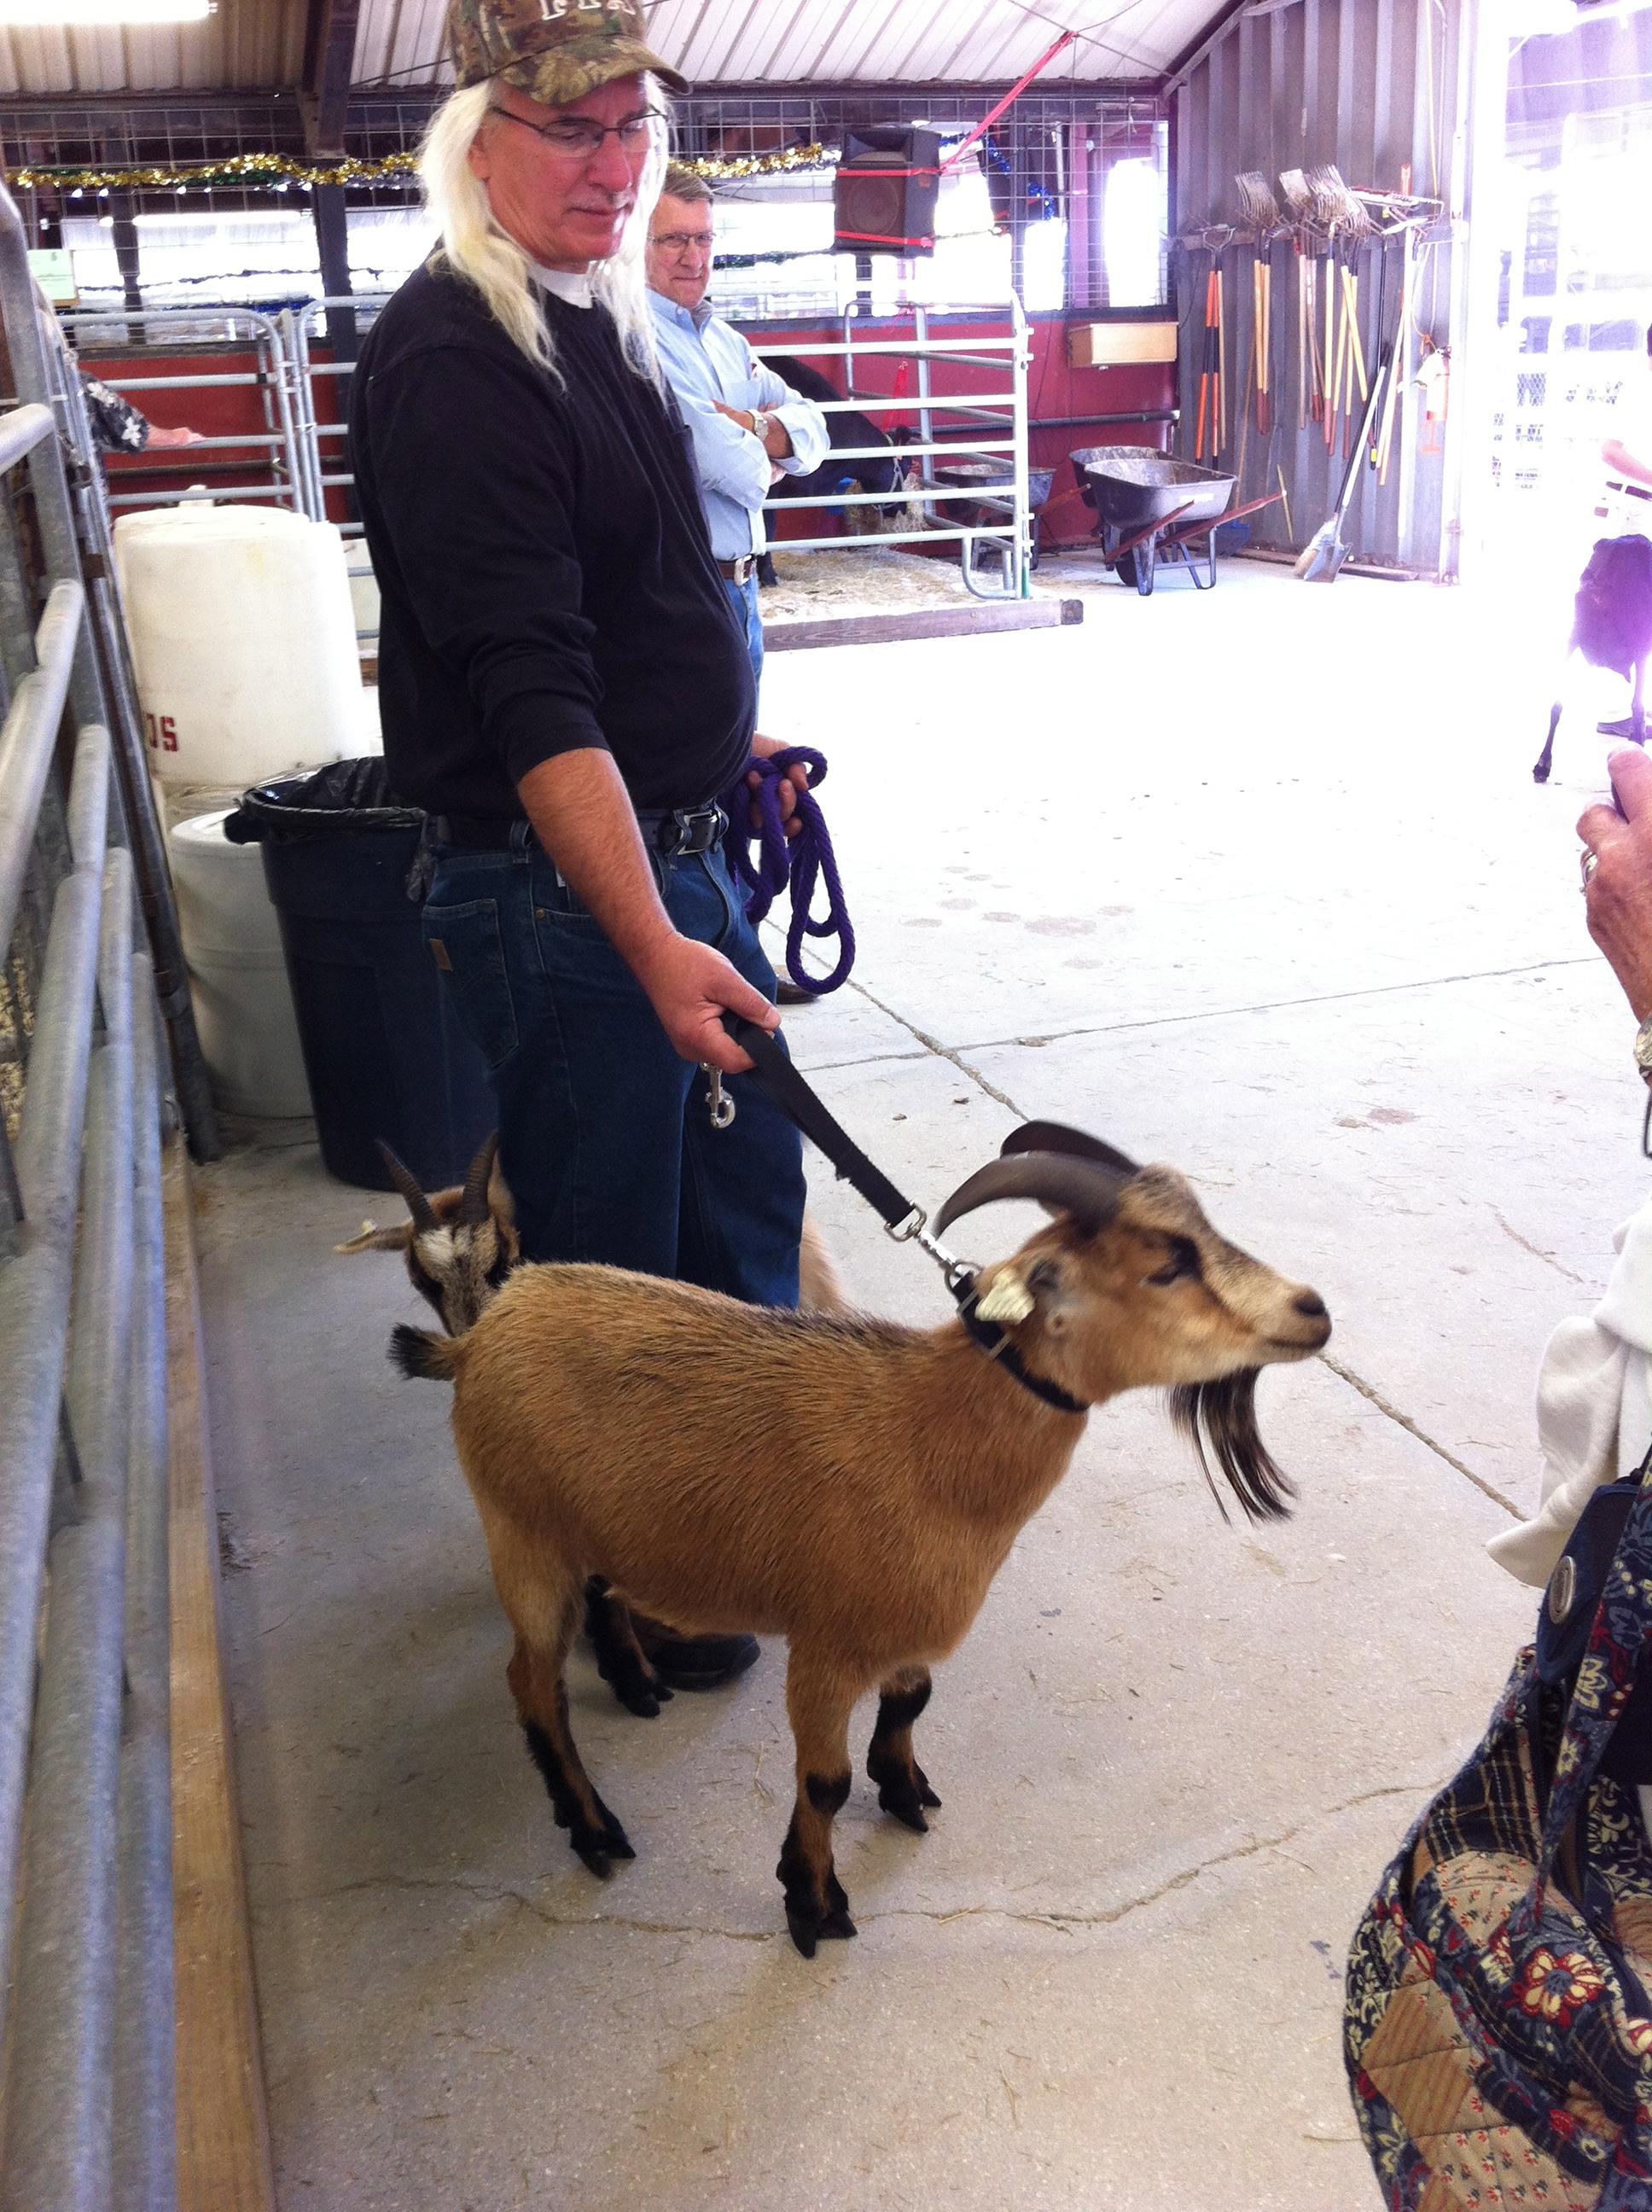 goat-man.jpg